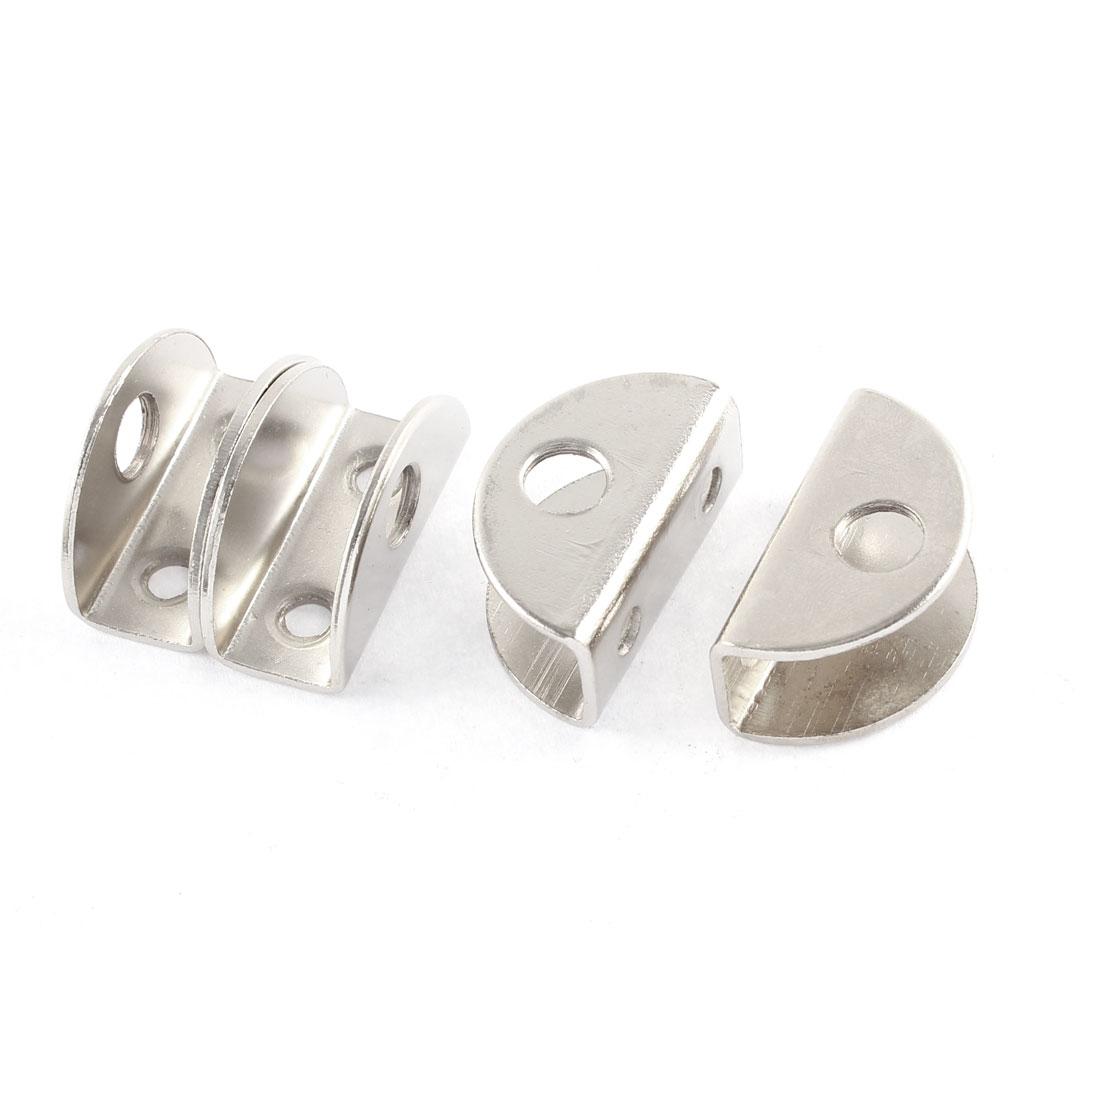 4 Pcs Silver Tone Semi-Circle Design 10mm Thickness Glass Clamp Clip